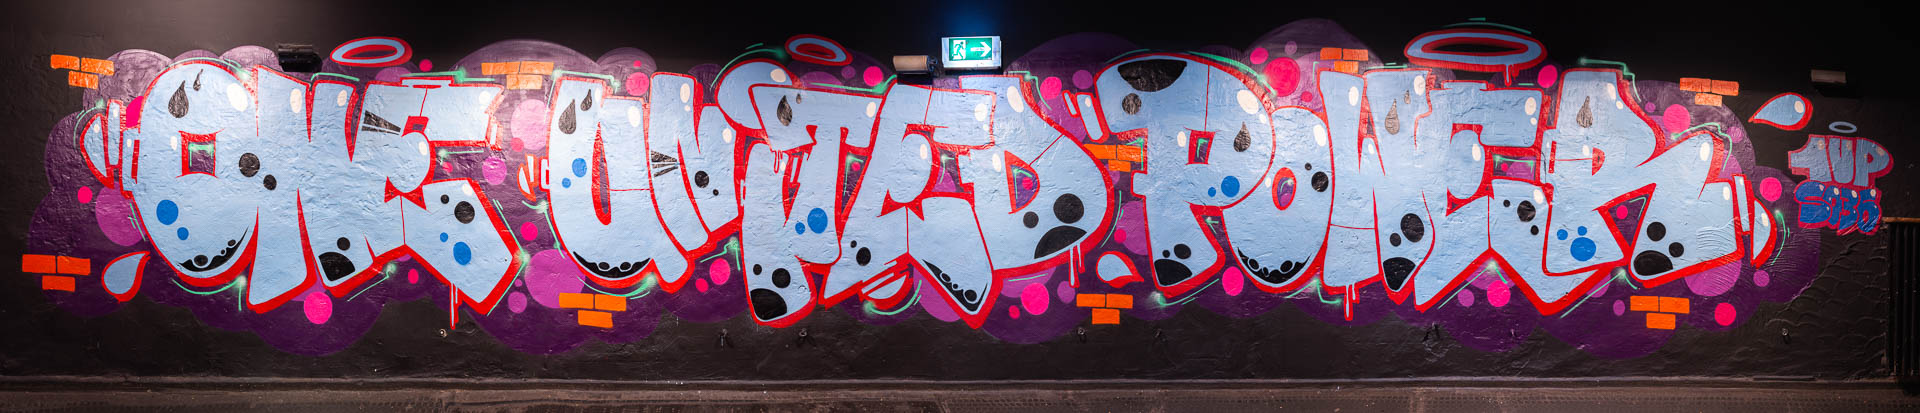 1UP Graffiti im SO36 Berlin